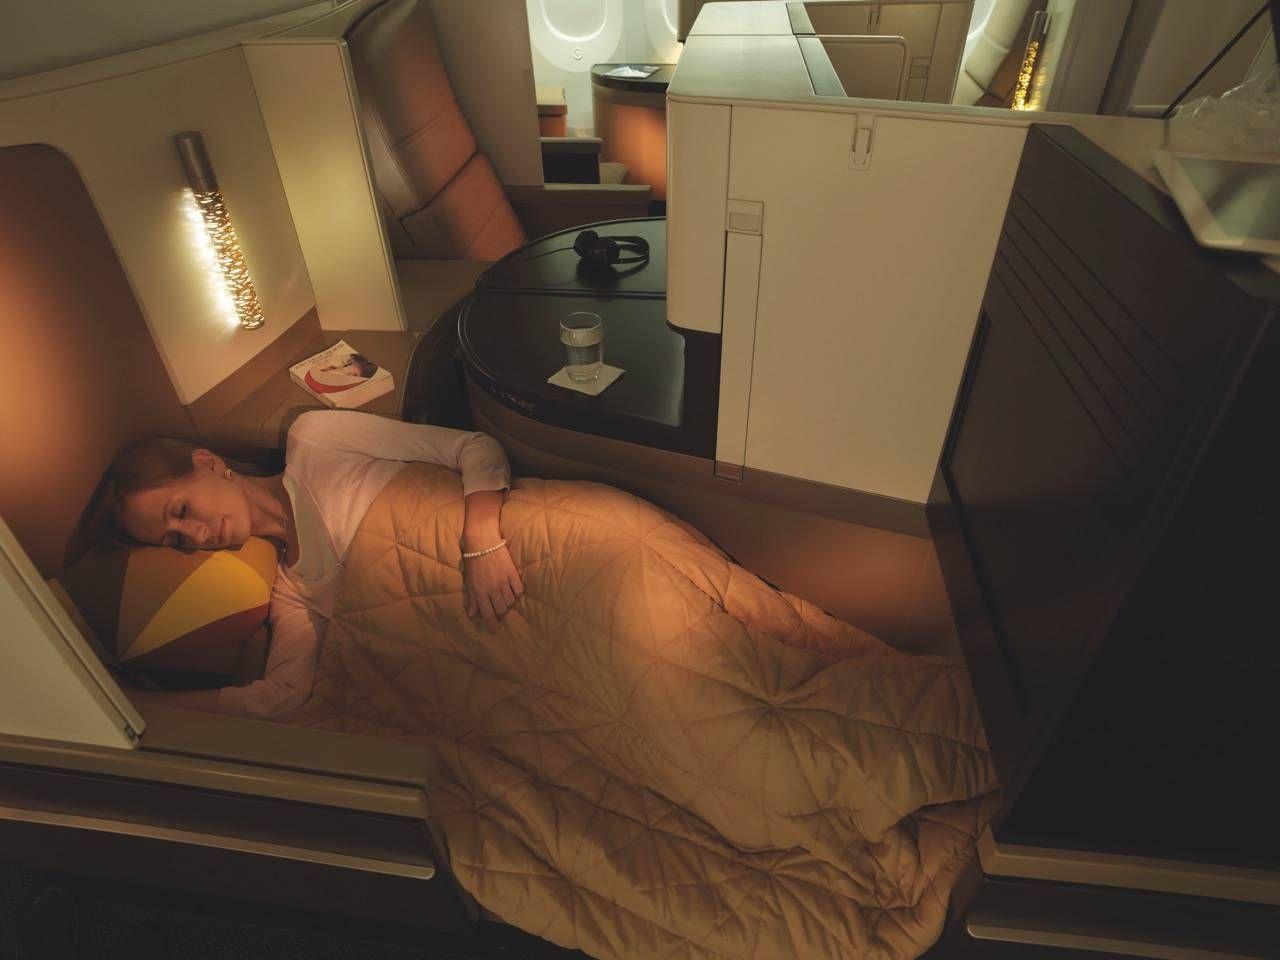 Business Studio_Sleeping Female Guest